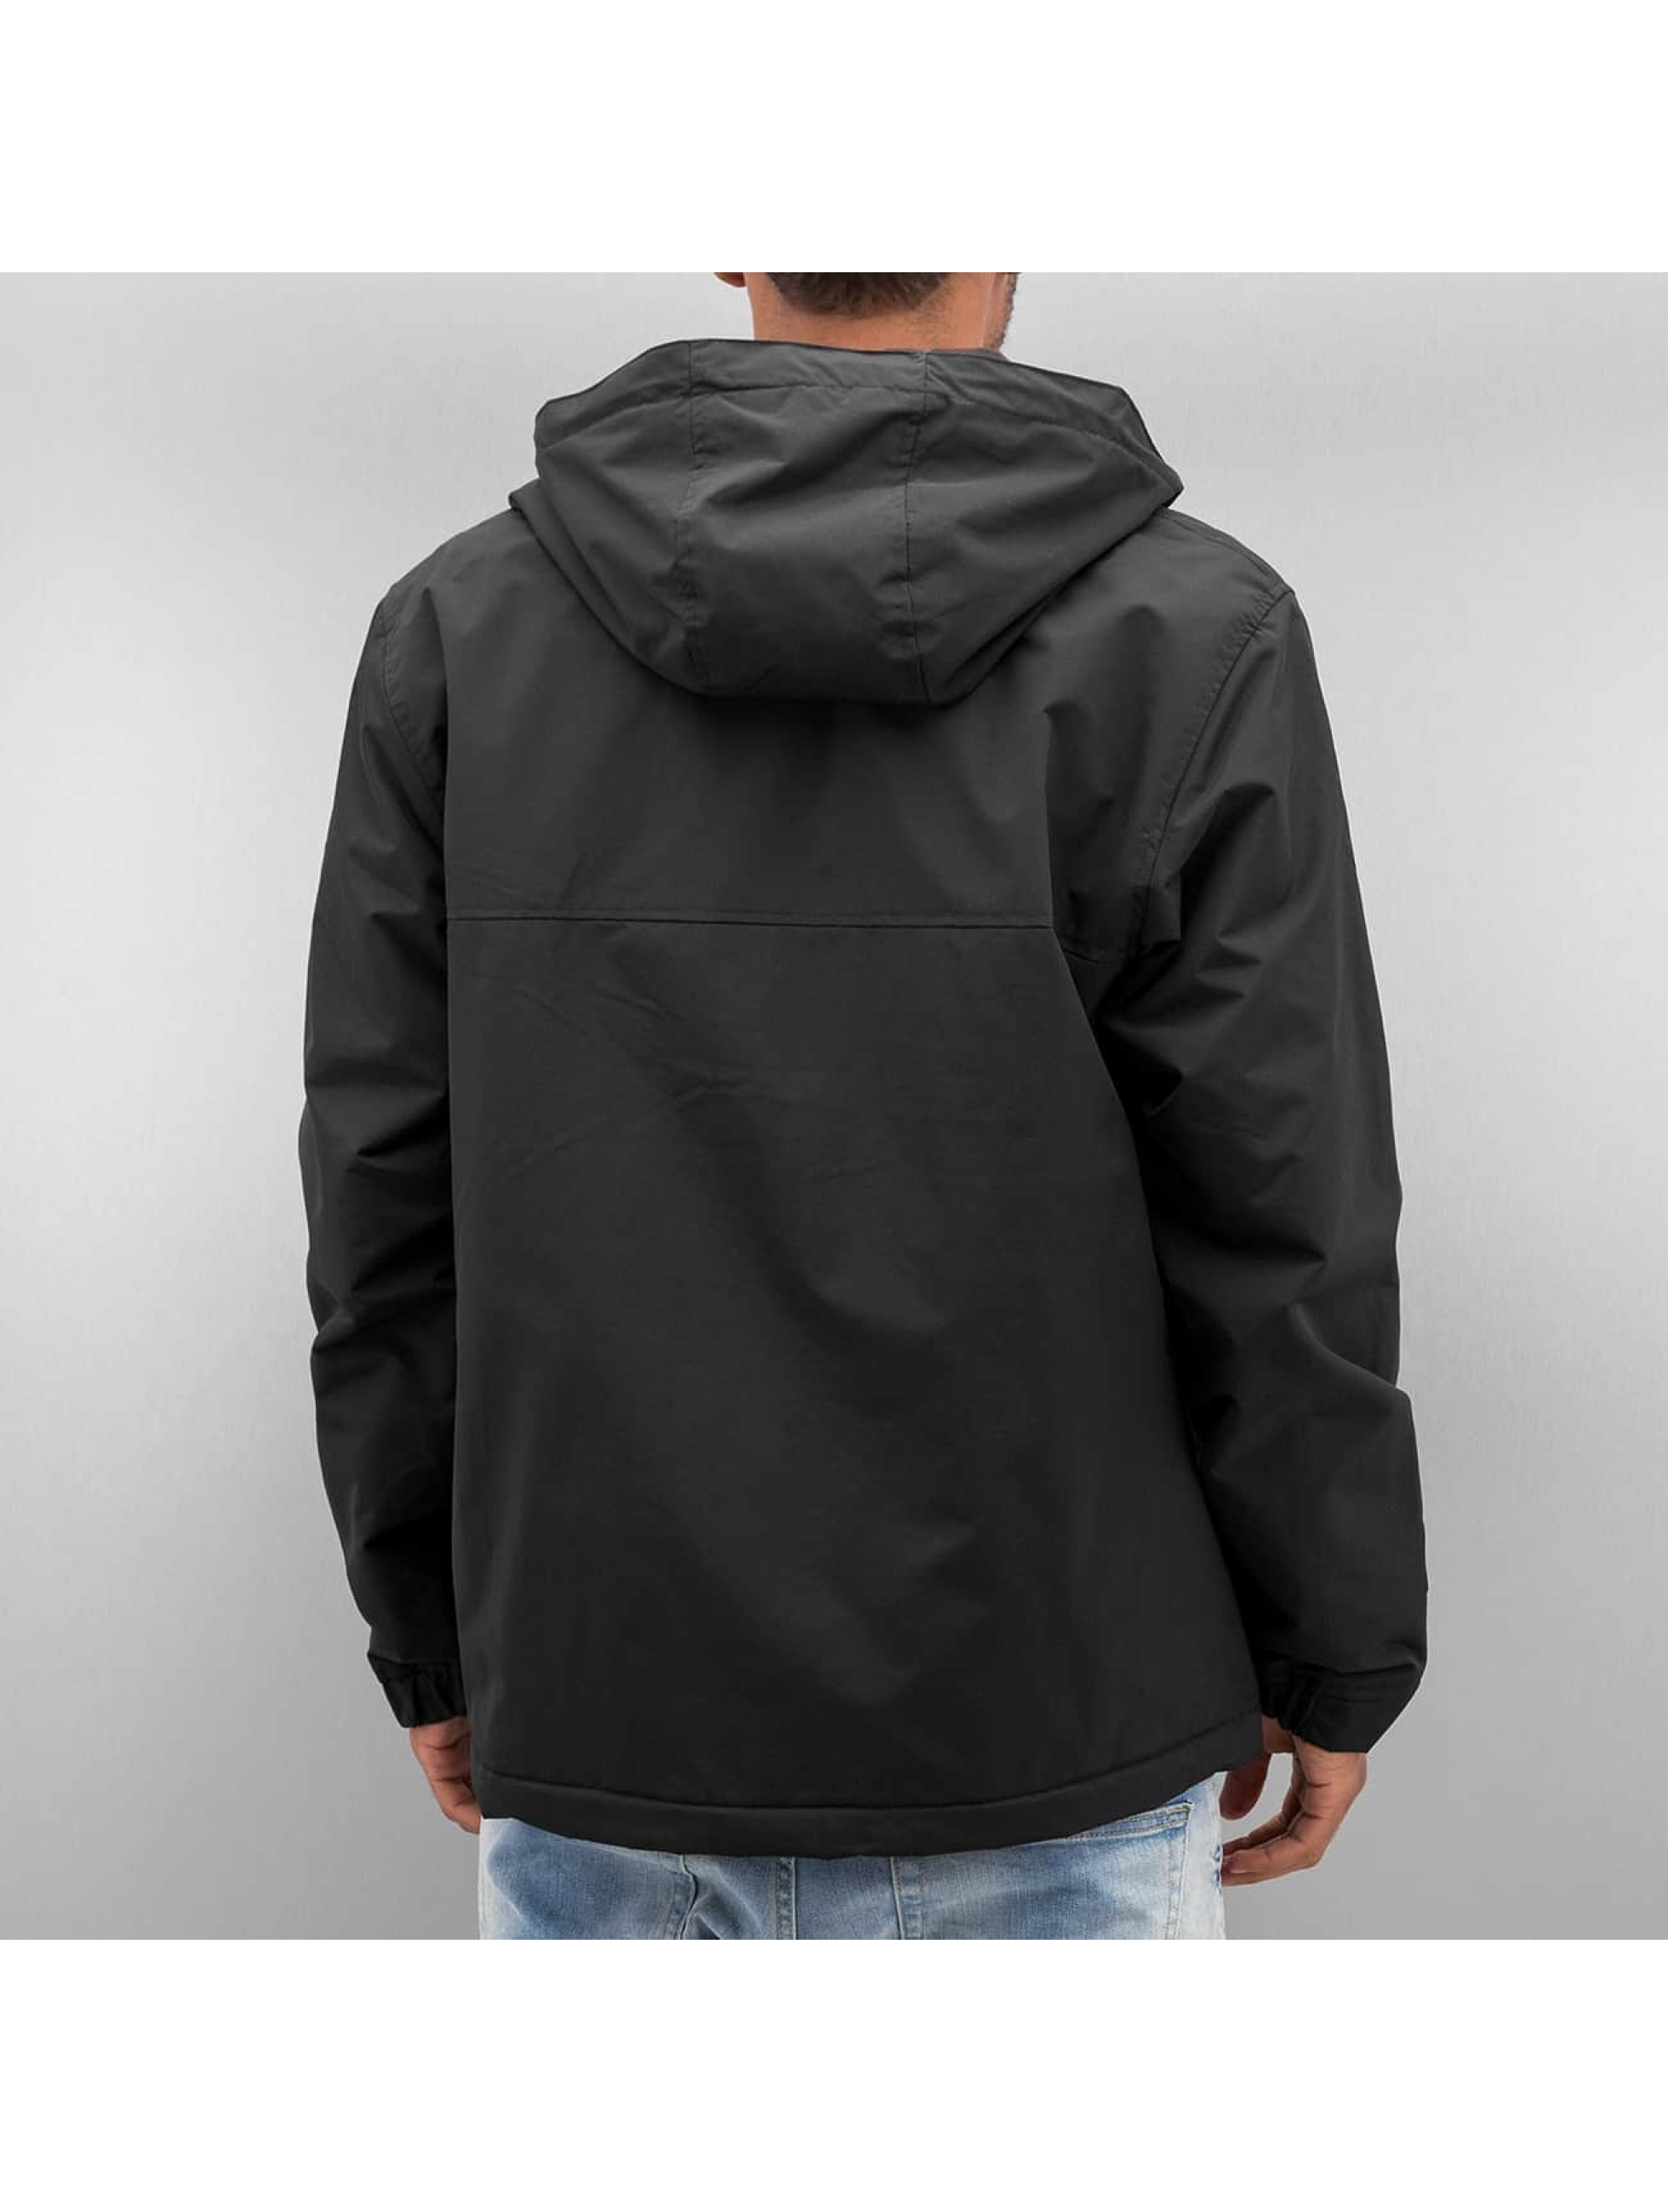 Carhartt WIP Демисезонная куртка Supplex Nylon Neil черный